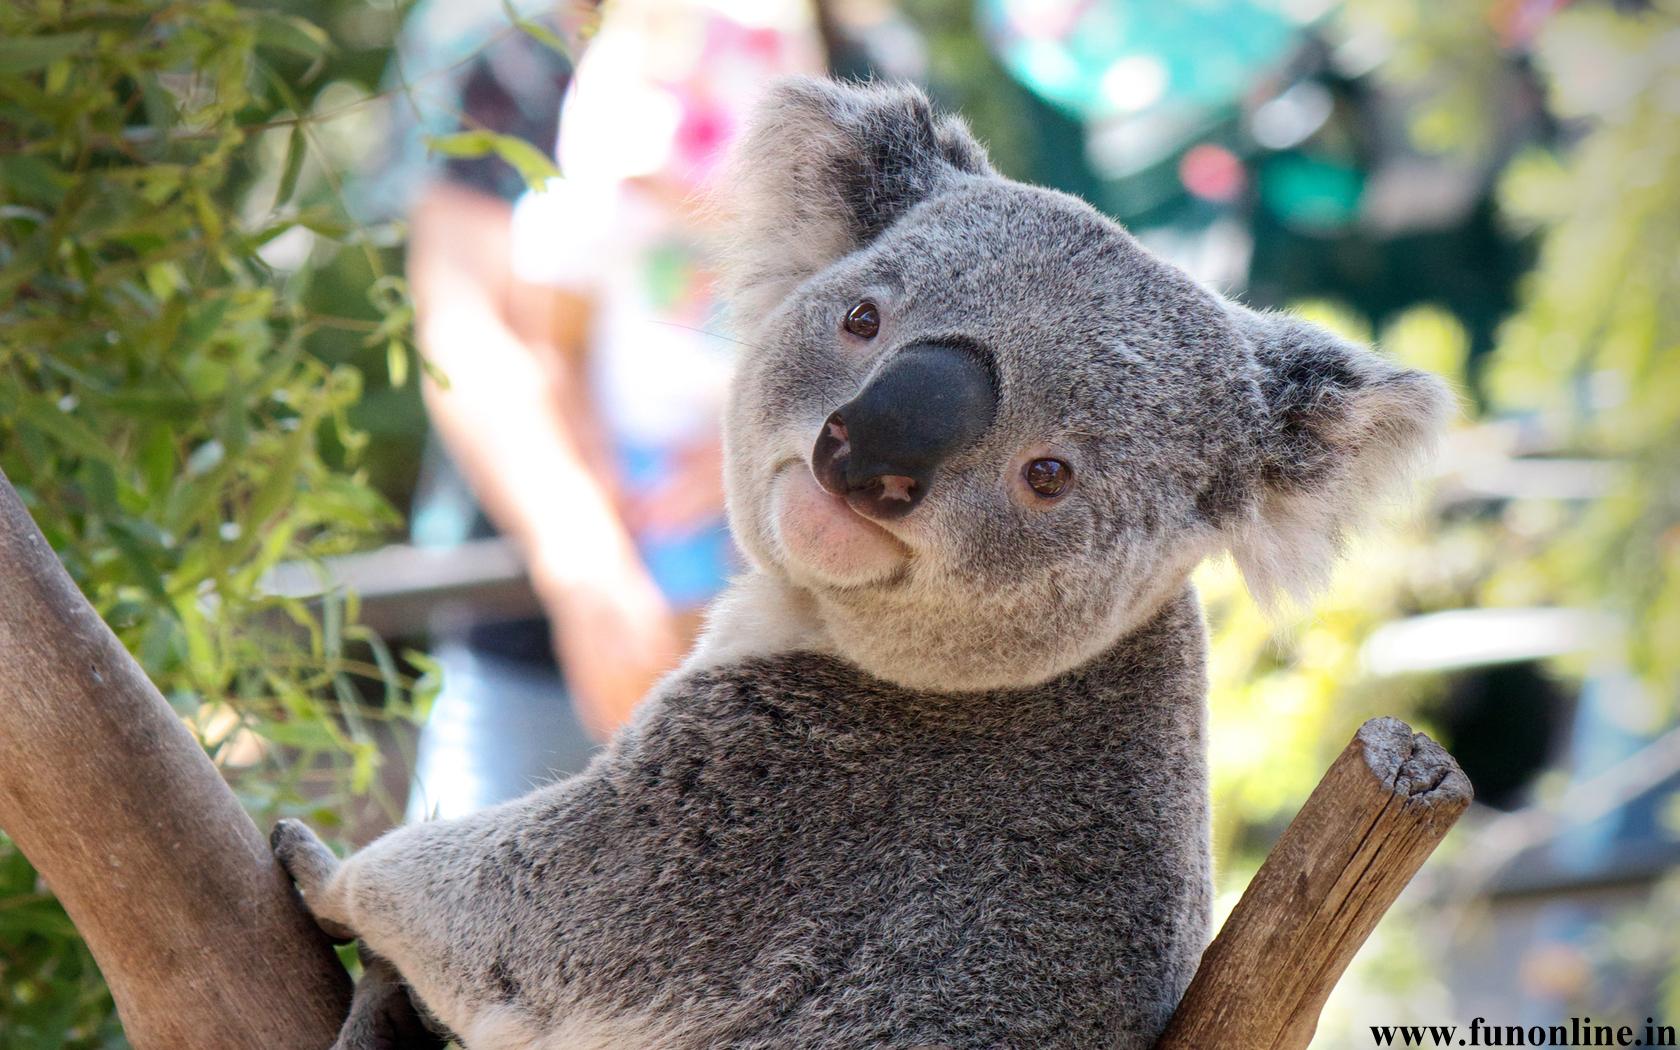 Koala Wallpapers Download Cute and Pretty Koalas HD Wallpaper 1680x1050